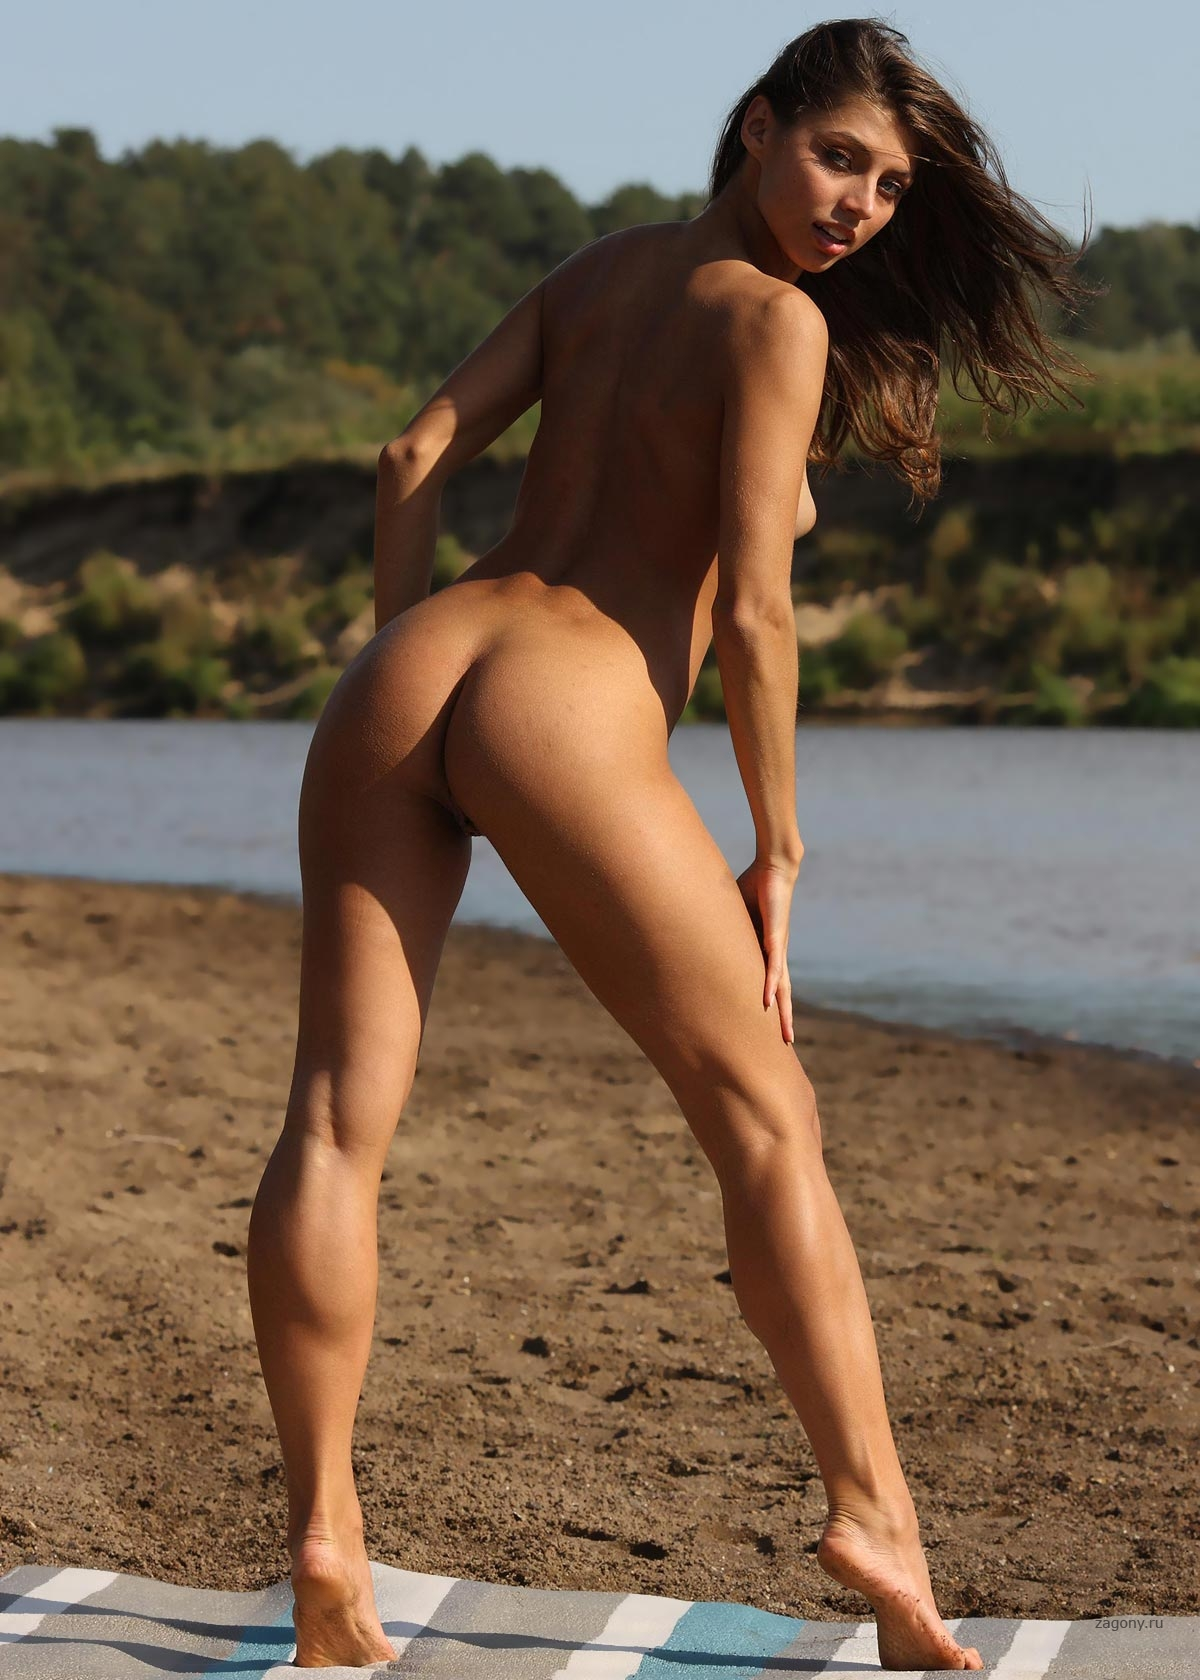 Валентина колесникова порно фото